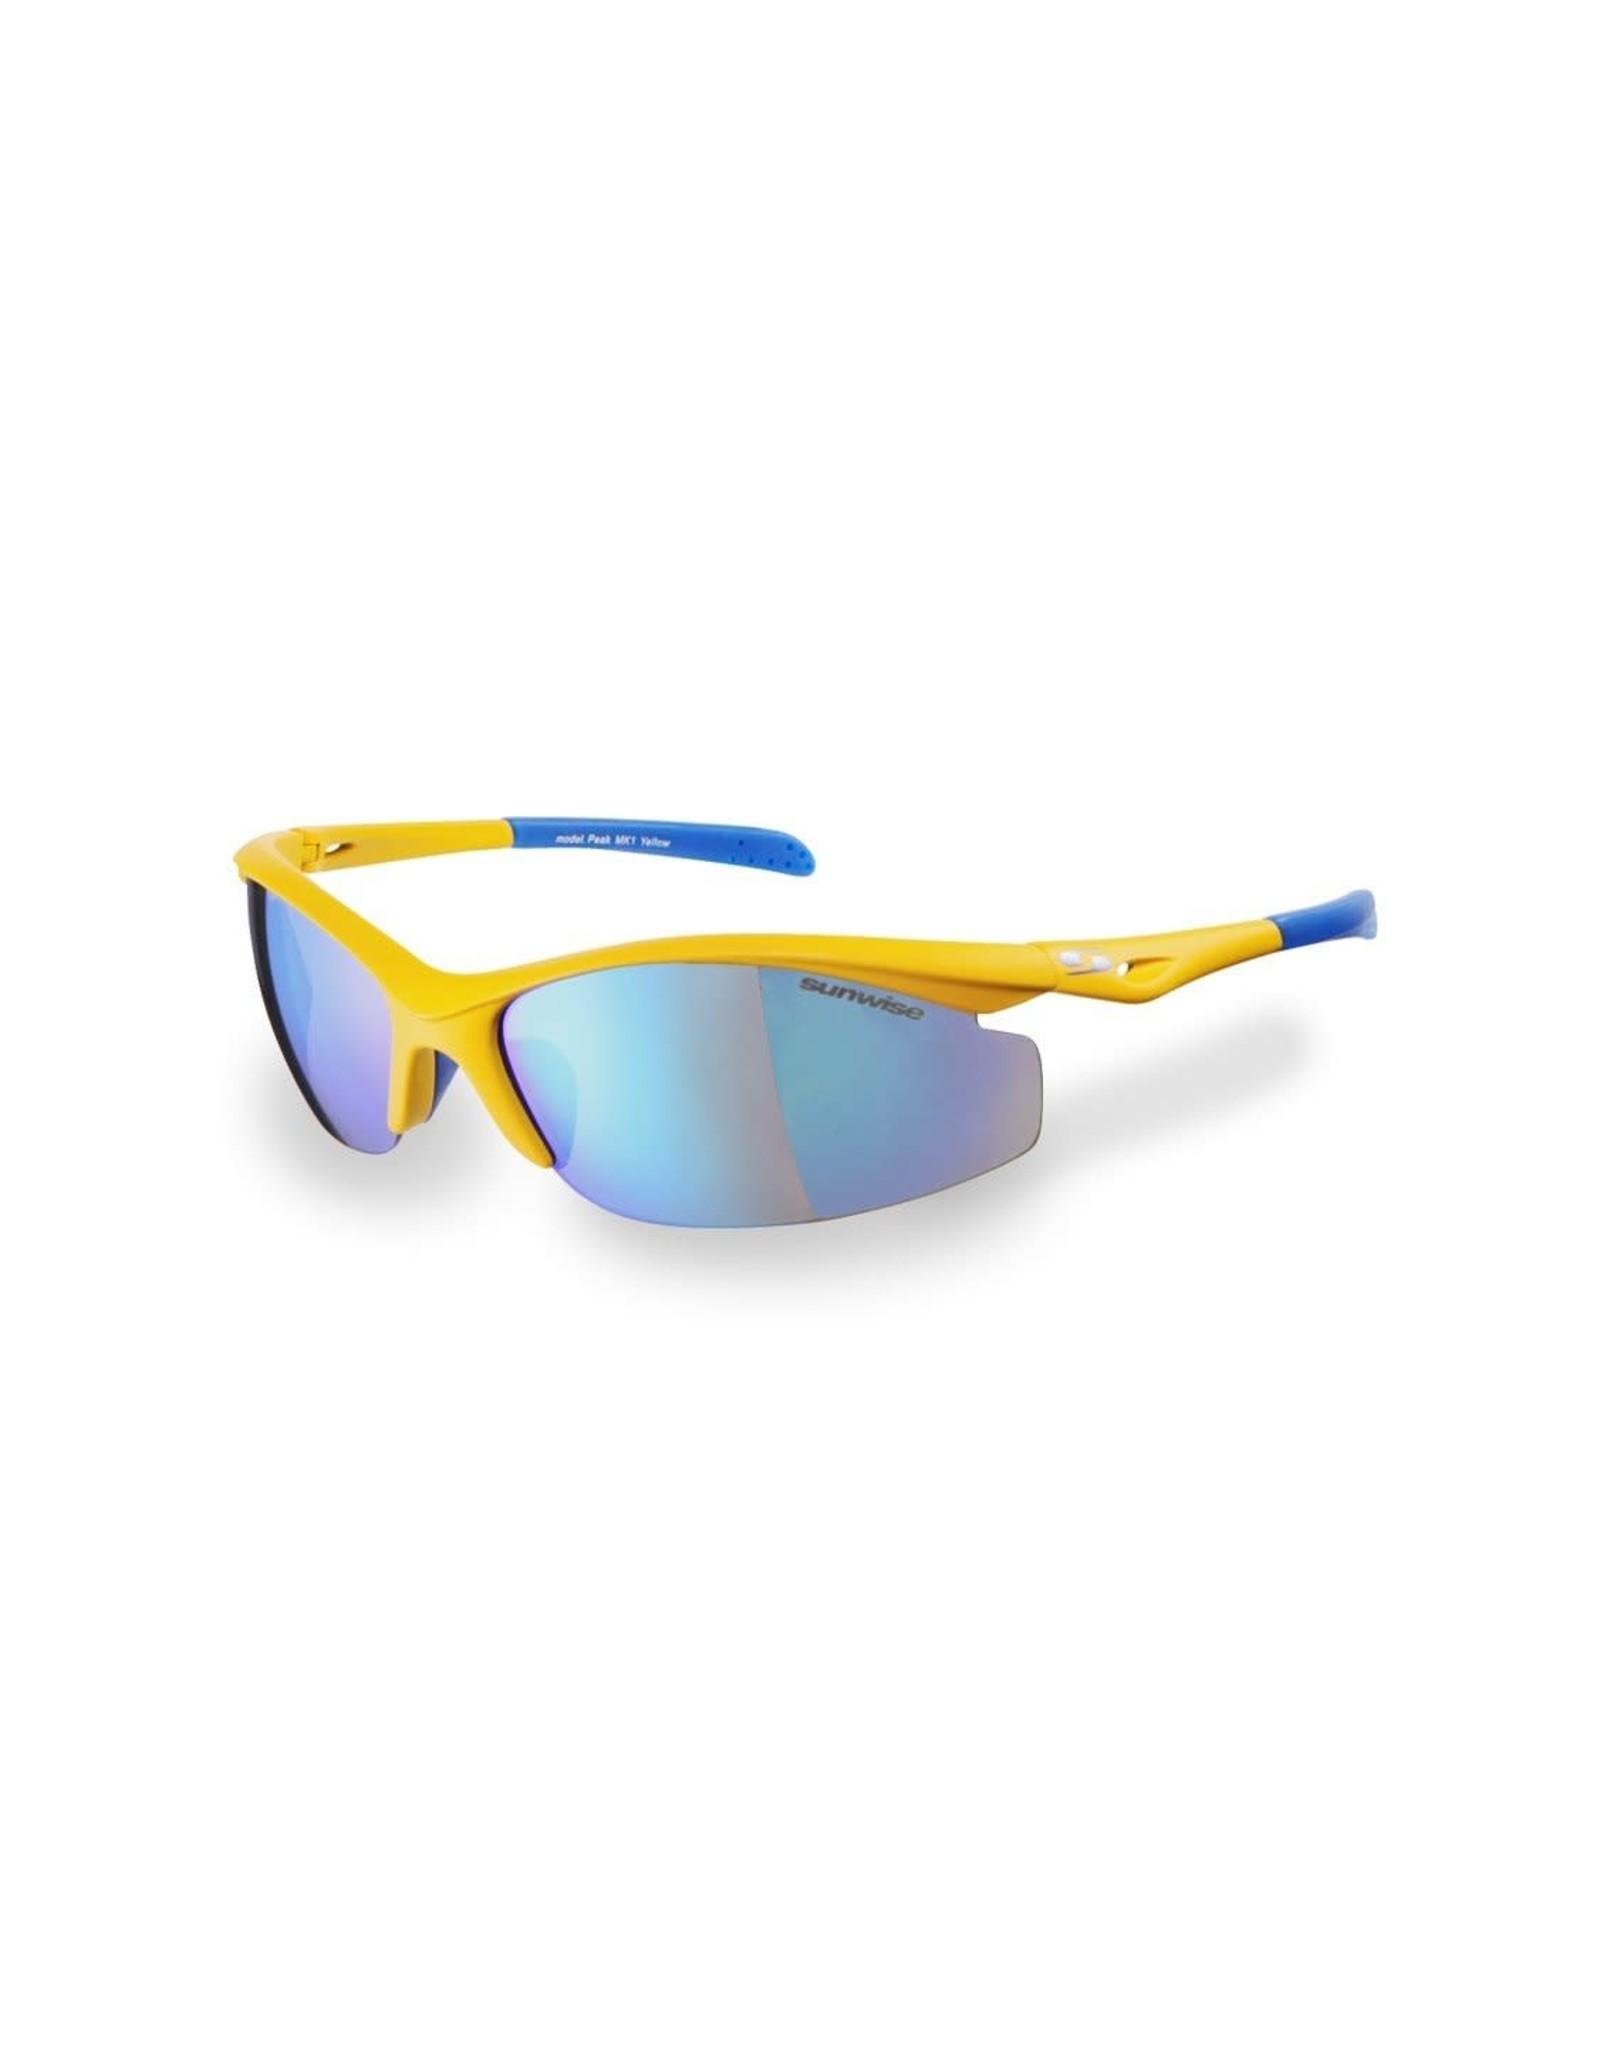 Sunwise Peak MK1 Cycling Sunglasses Yellow